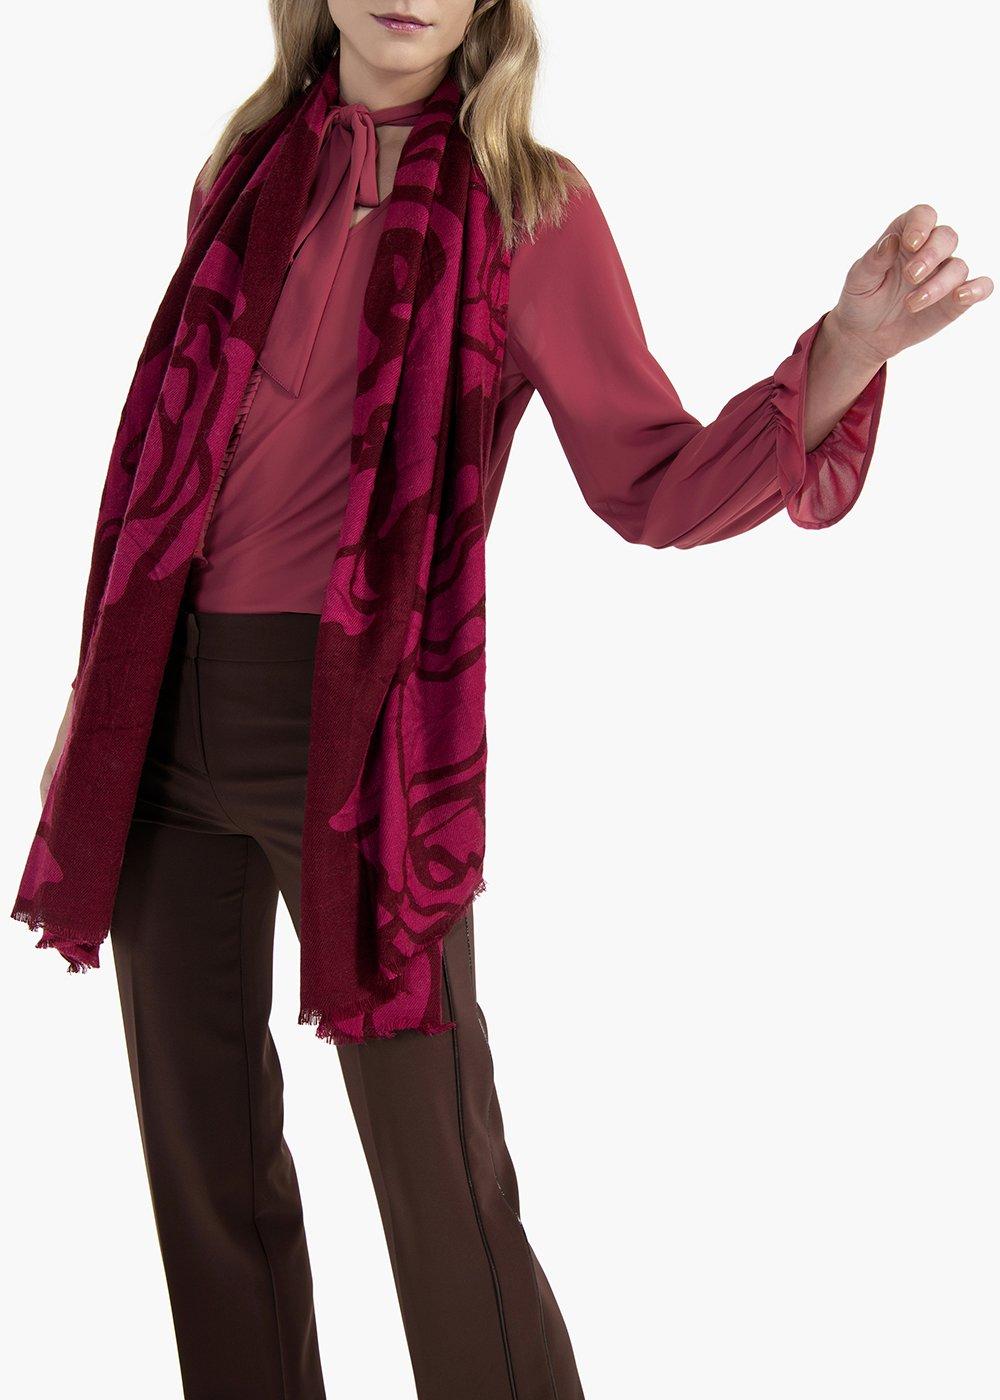 Bicolor roses print scarf Selmar - Magnolia Fantasia - Woman